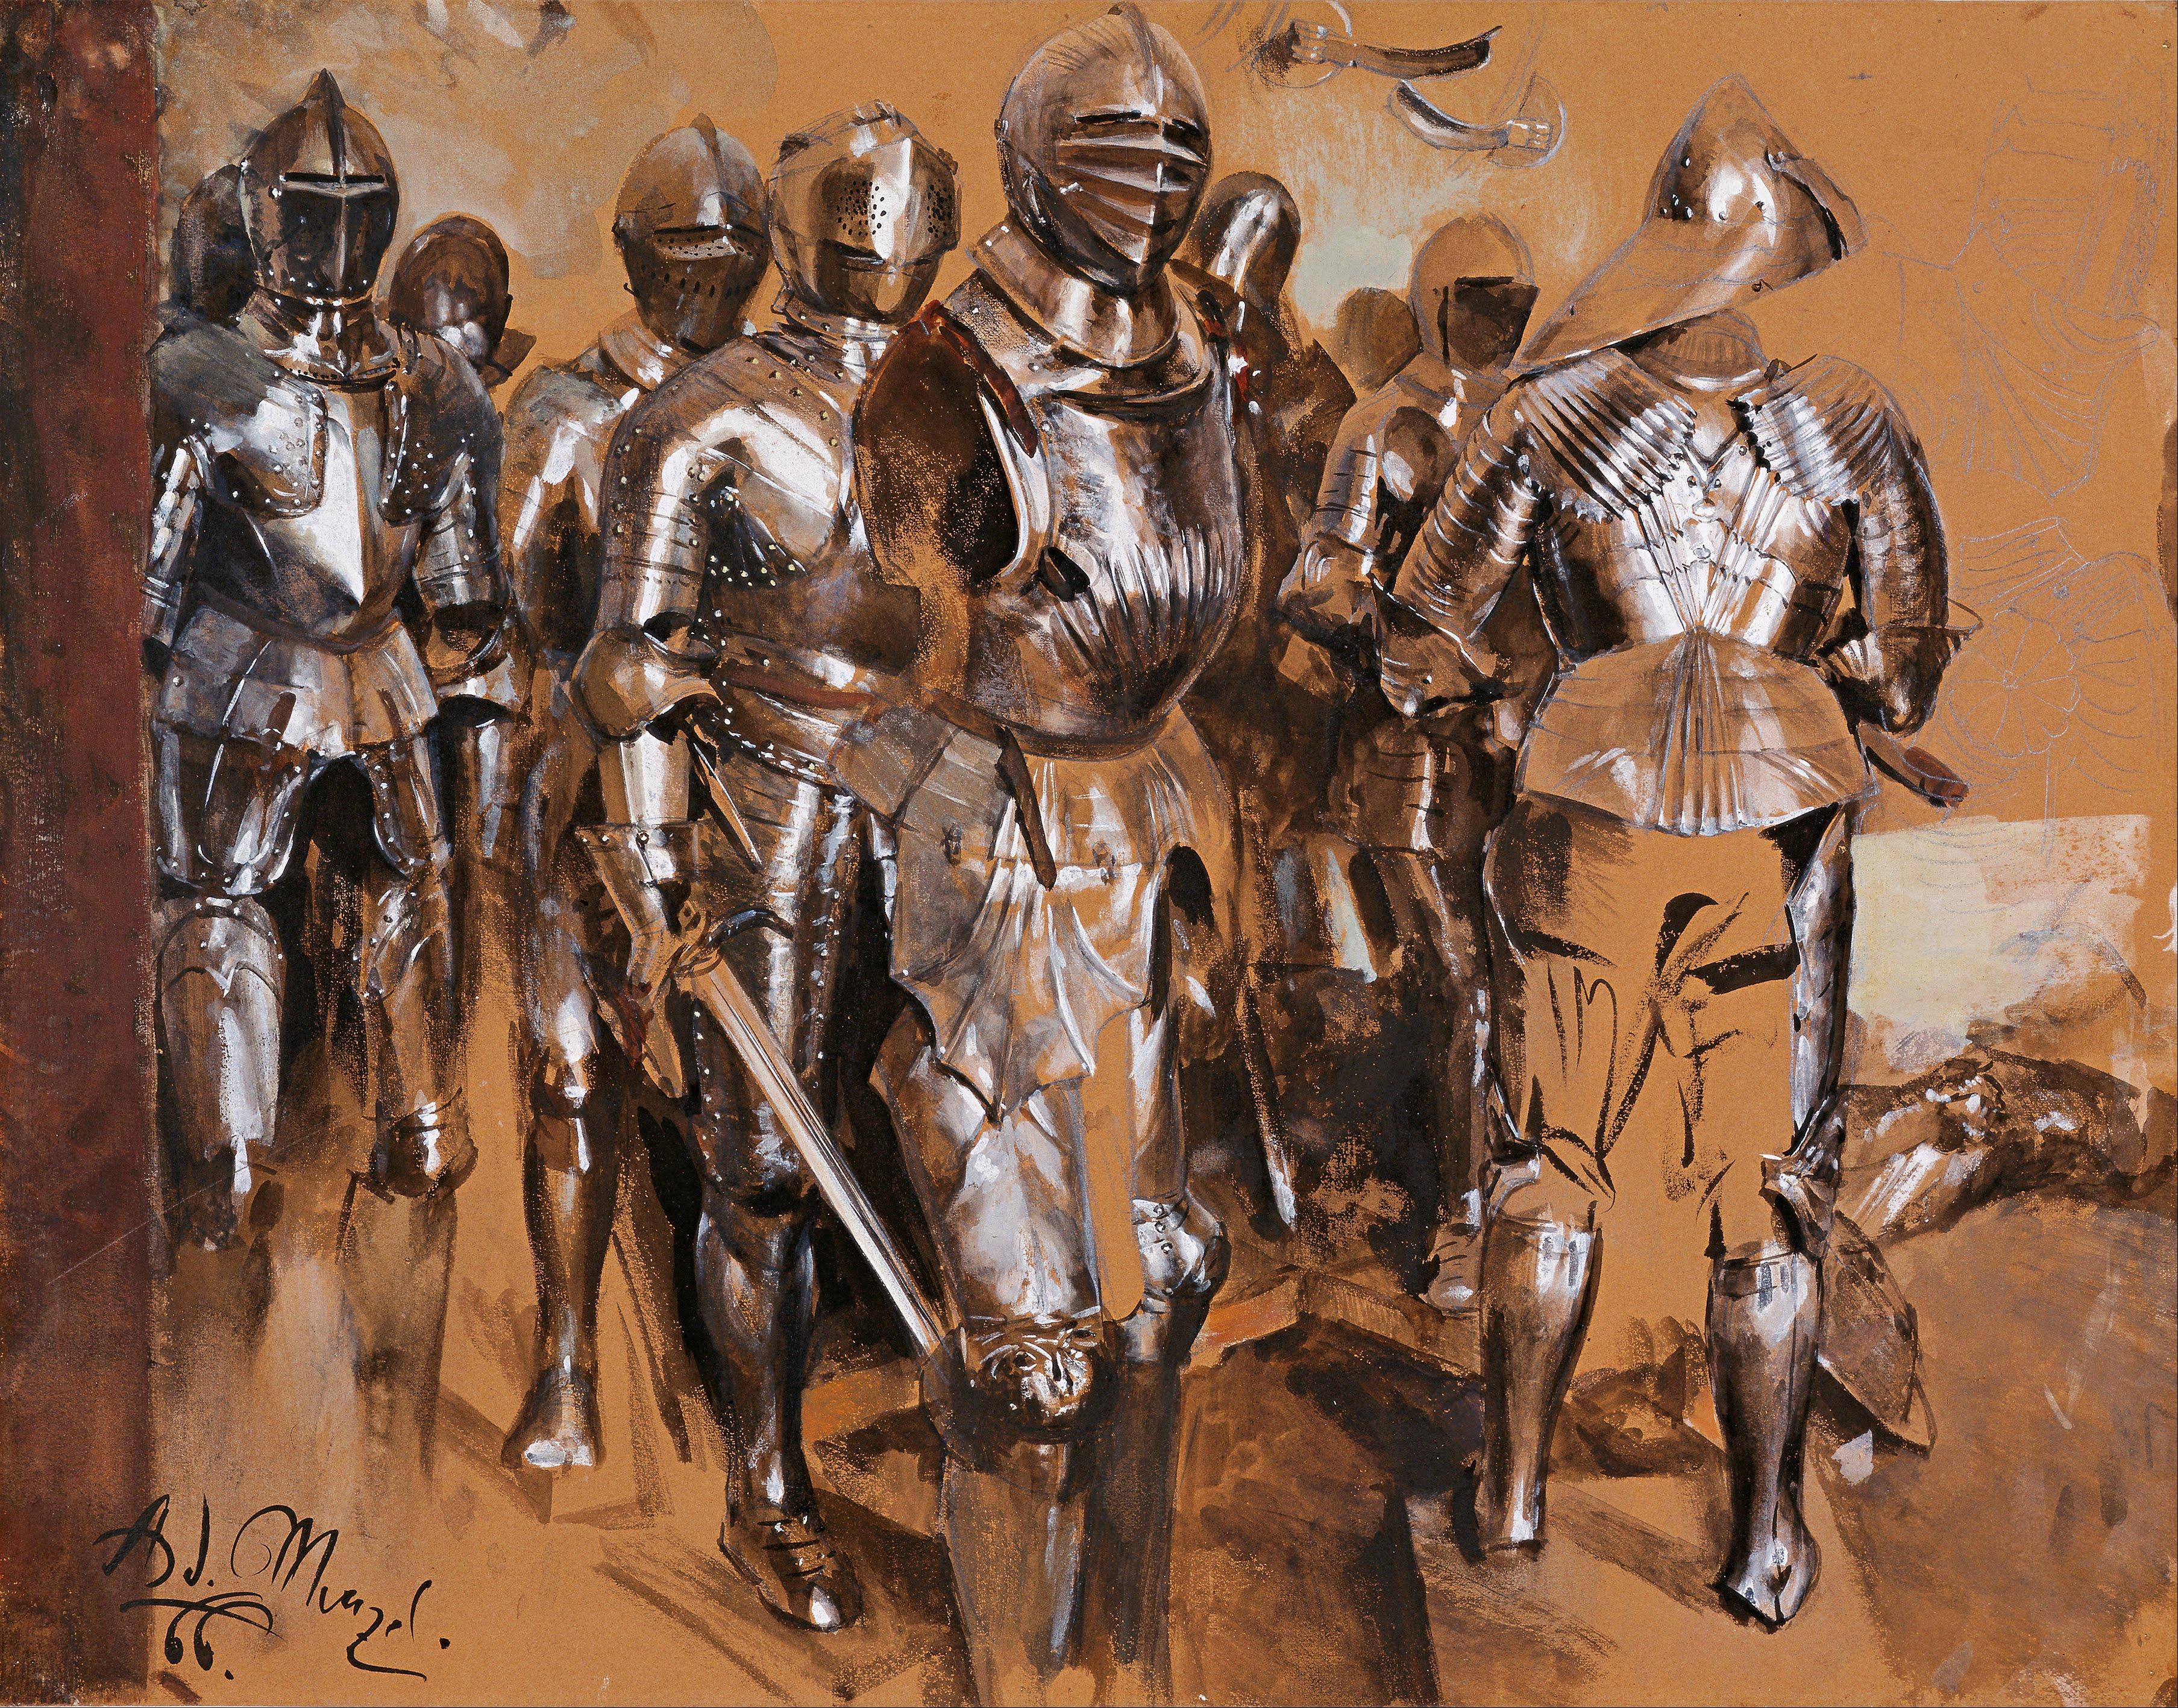 Adolf_Menzel_-_-Armor_Chamber_Fantasy-,_1866_